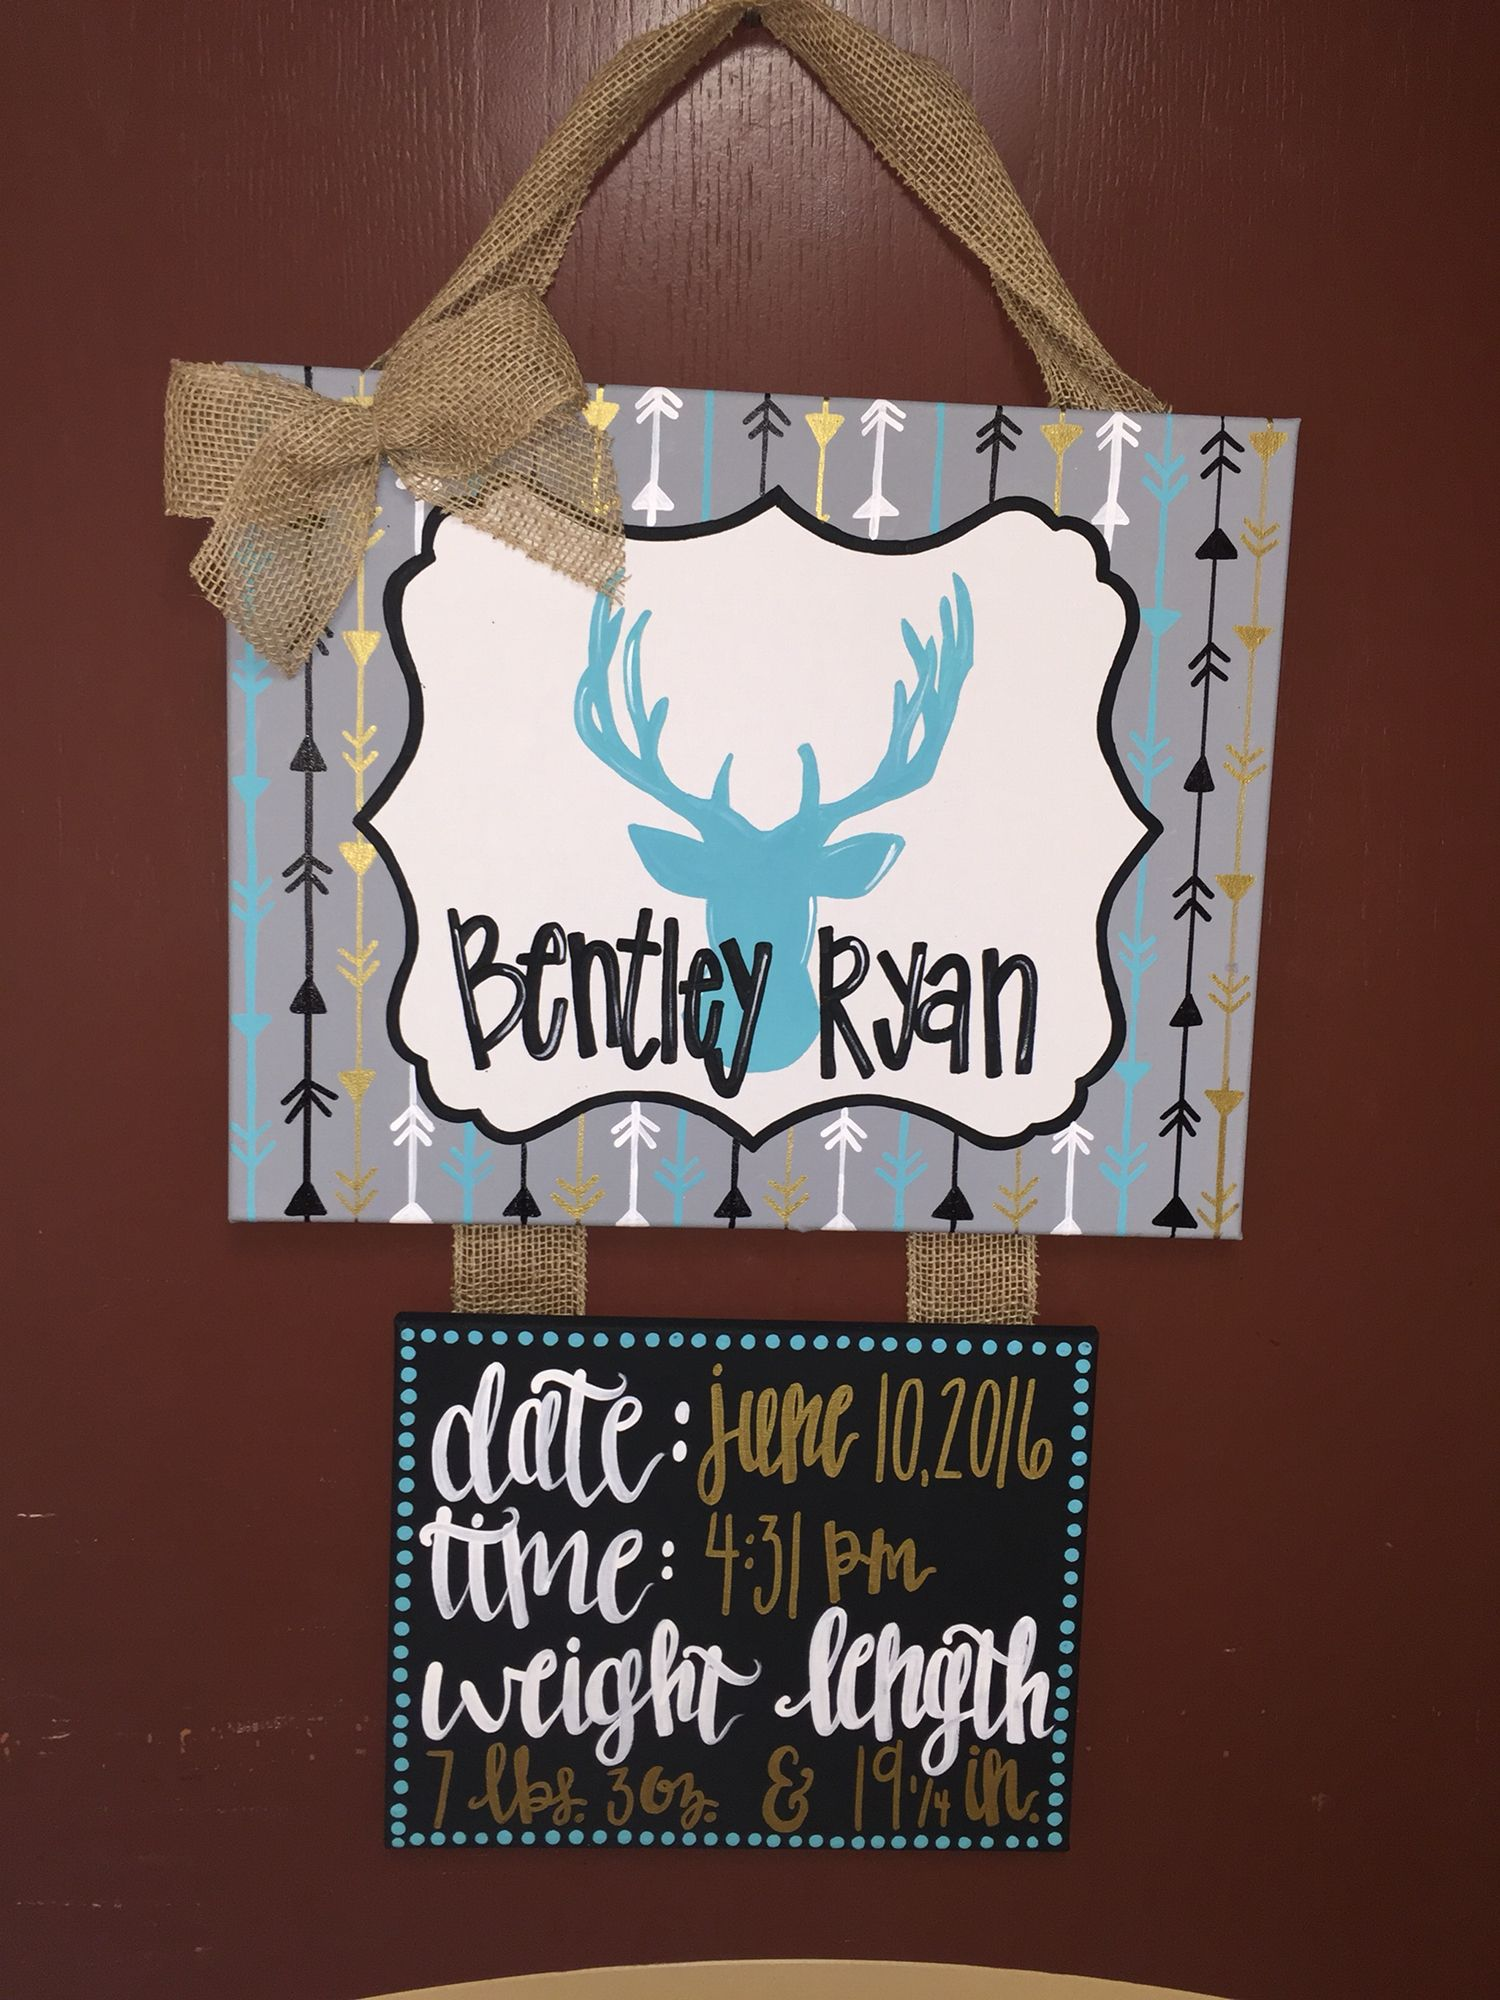 Baby Boy Birth Announcement Door Hangers : birth, announcement, hangers, Hospital, Hanger, Birth, Stats,, Canvas, Painting,, Deer,, Arrows., Turquoise,navy, Gold., Announcement,, Camo,, Hangers